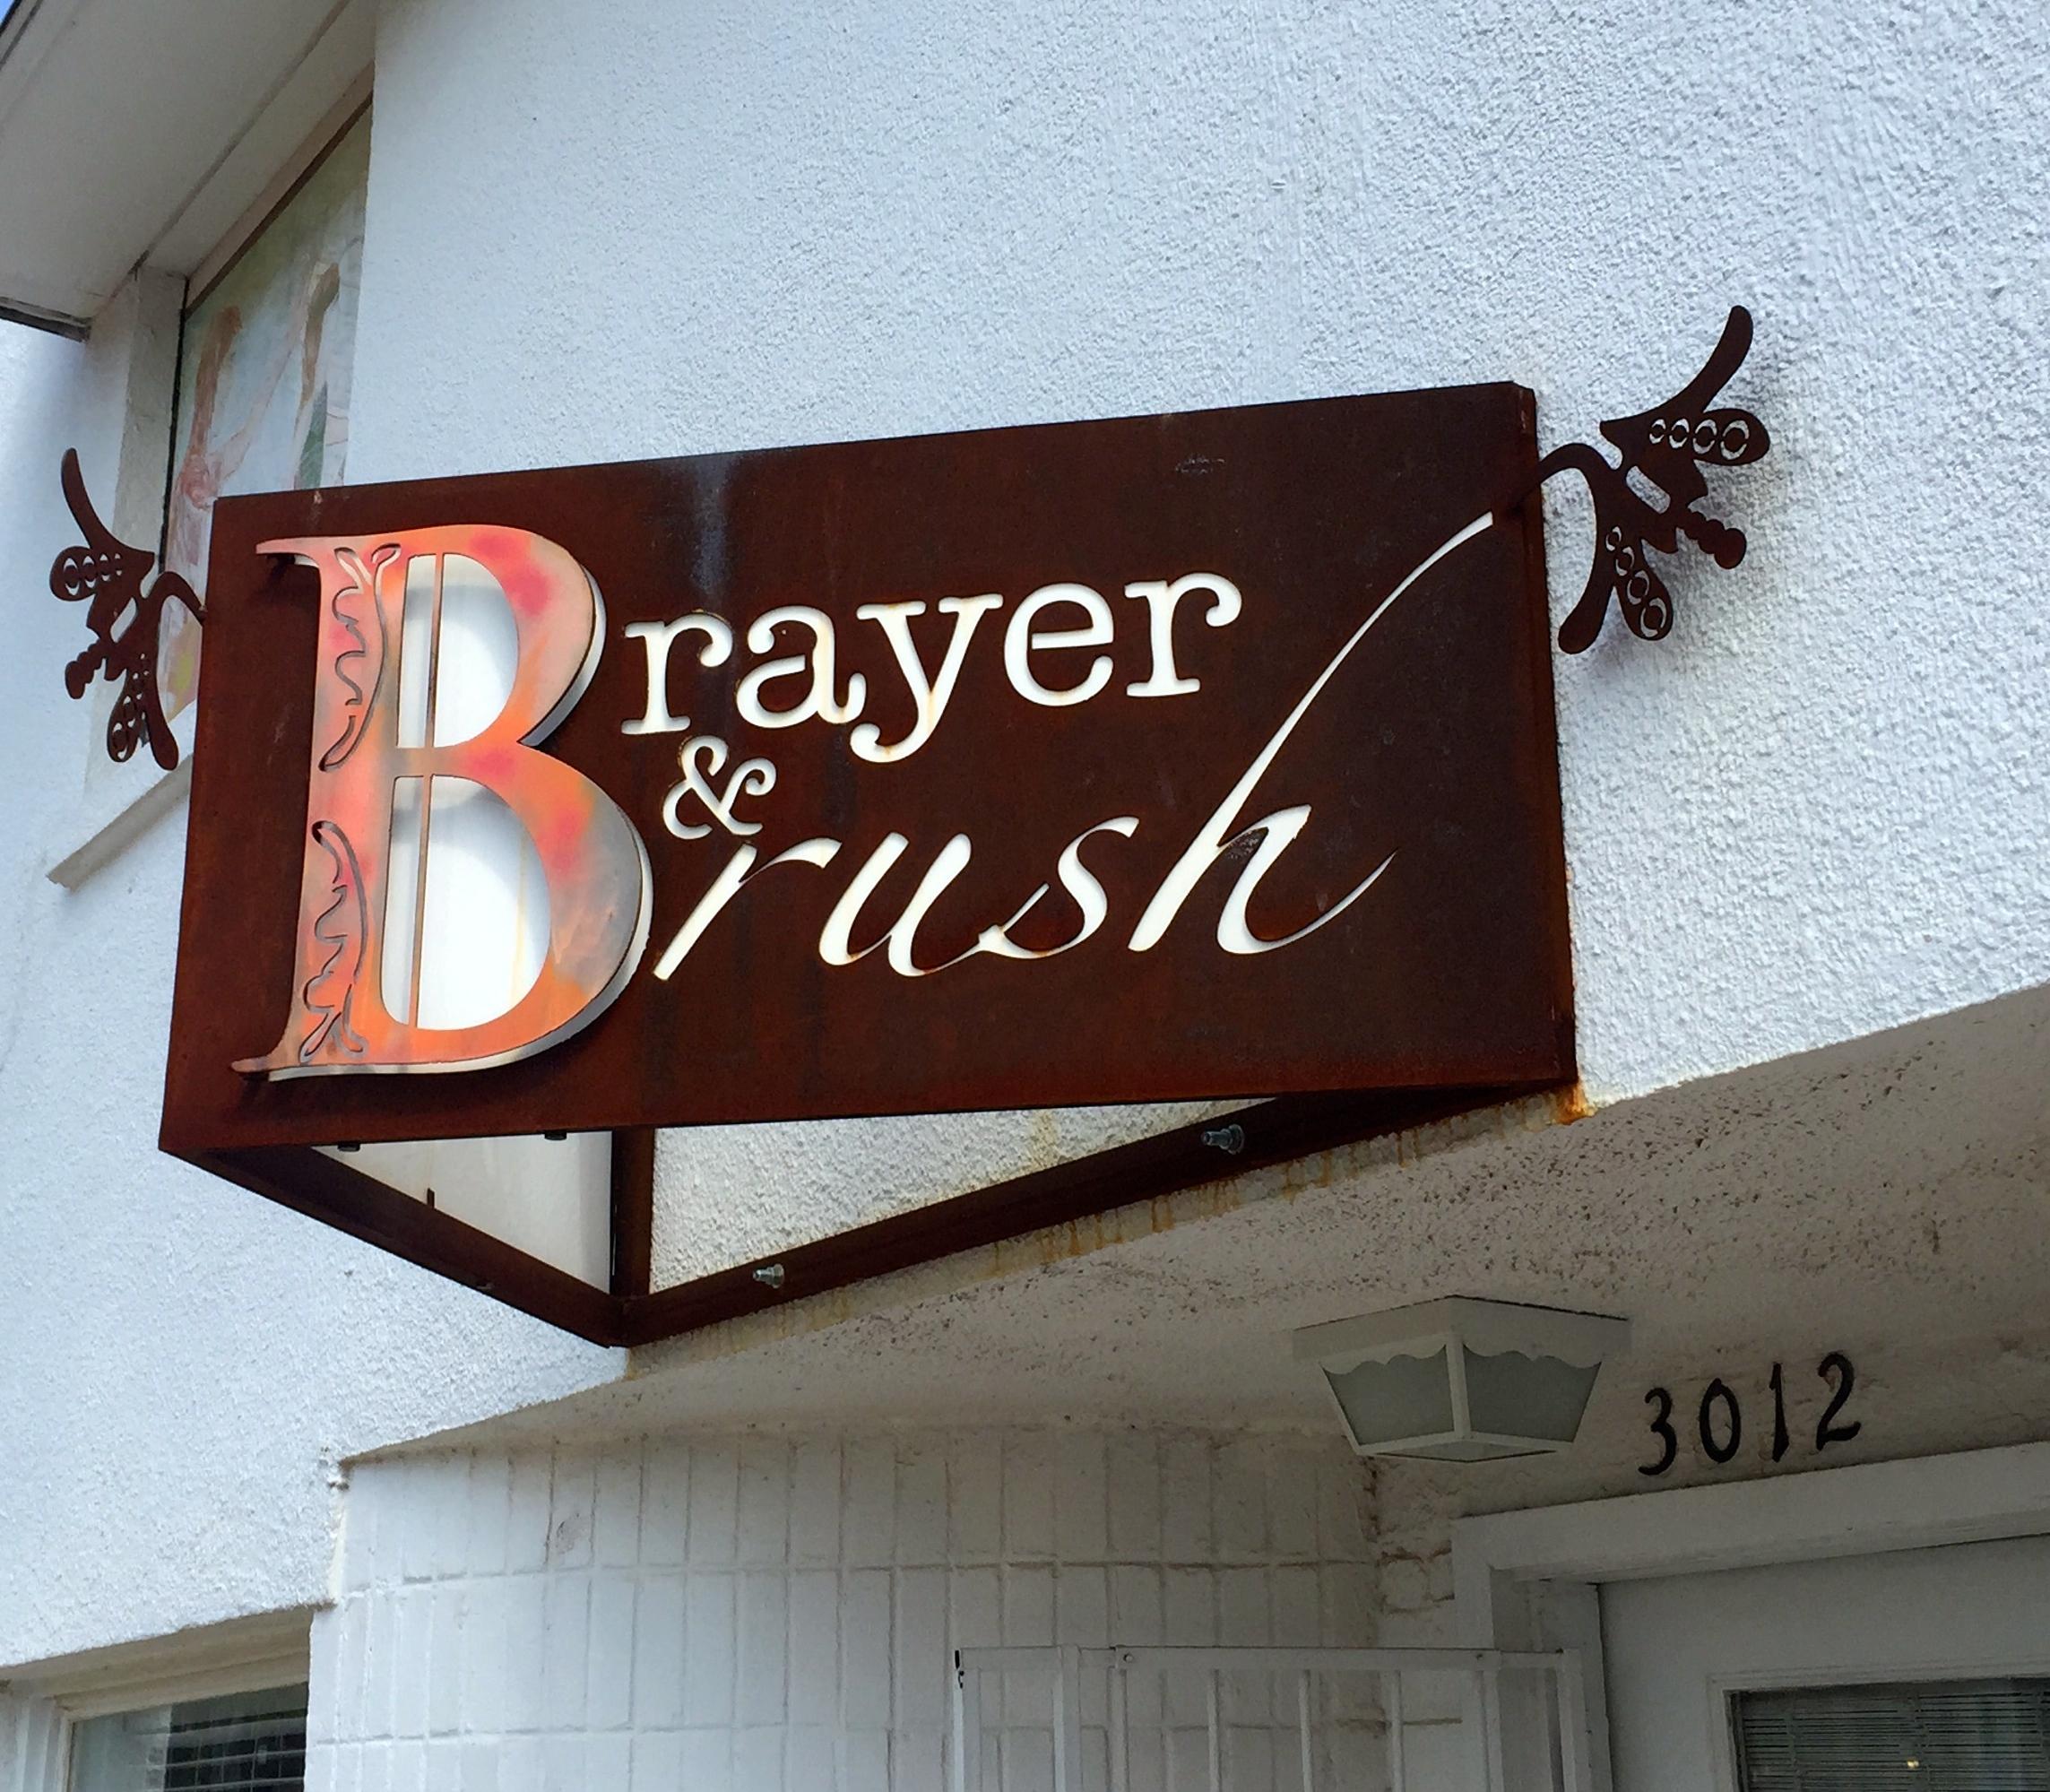 Brayer&Brush